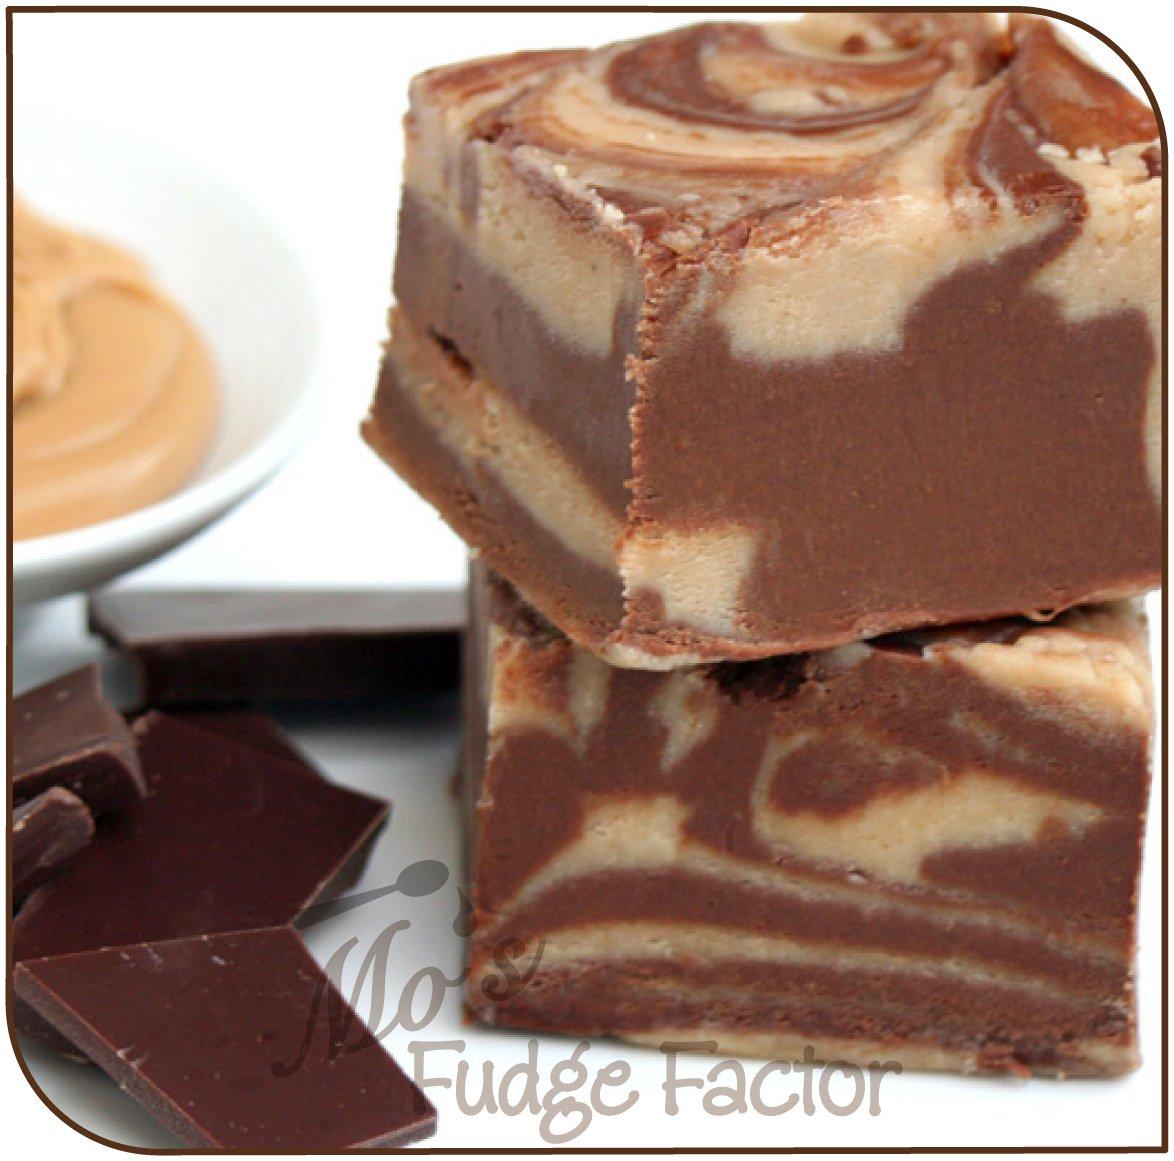 Mo's Fudge Factor, Chocolate Peanut Butter Fudge 2 pounds